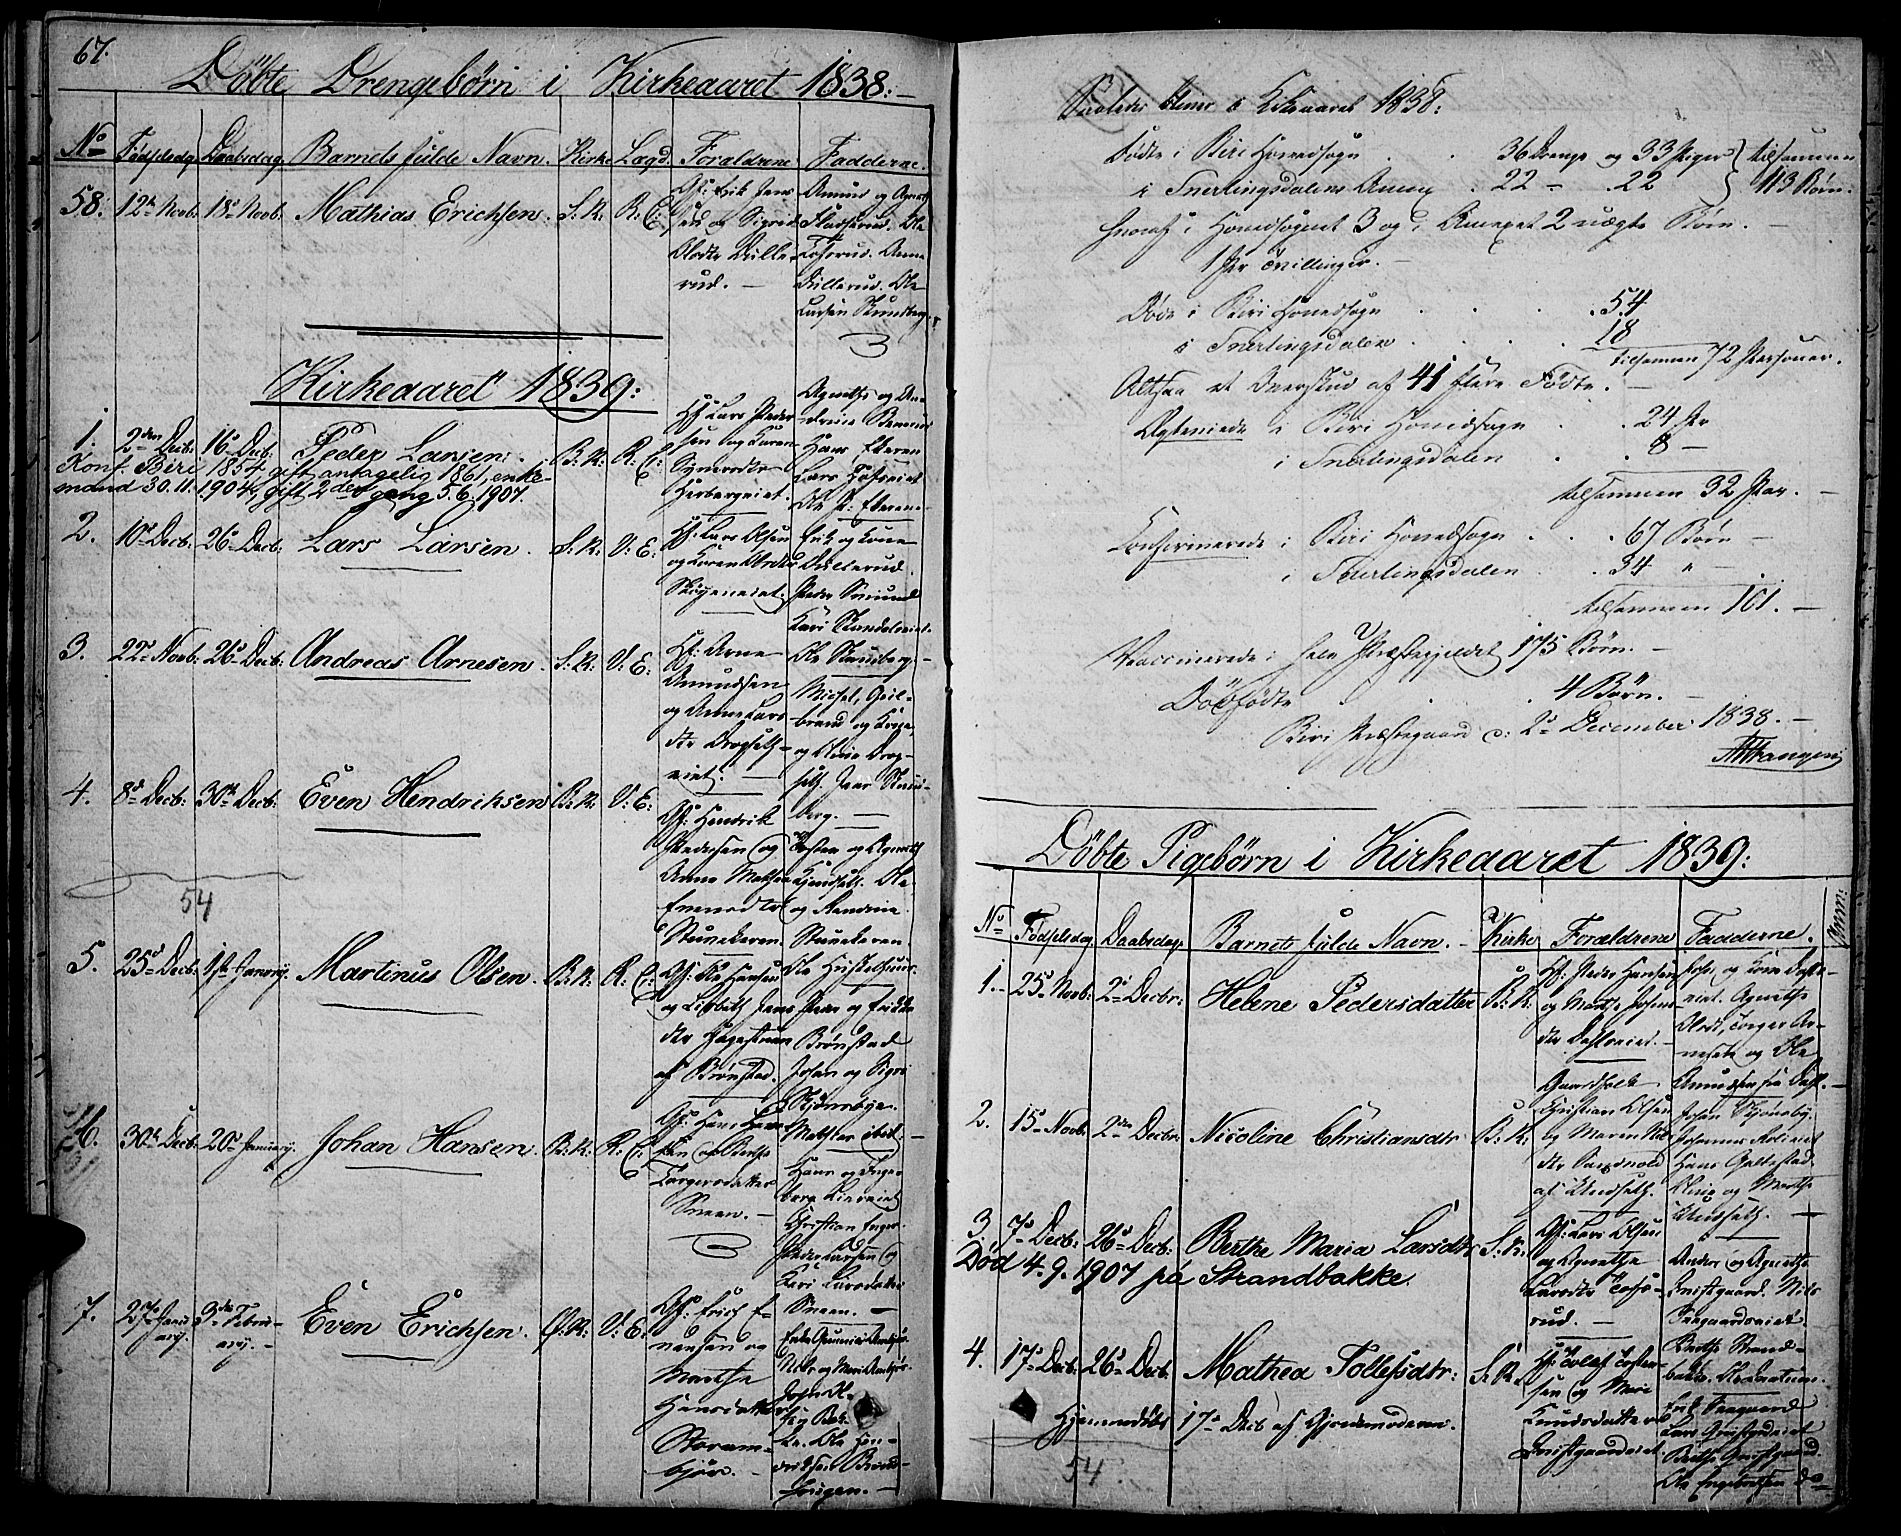 SAH, Biri prestekontor, Ministerialbok nr. 4, 1829-1842, s. 67